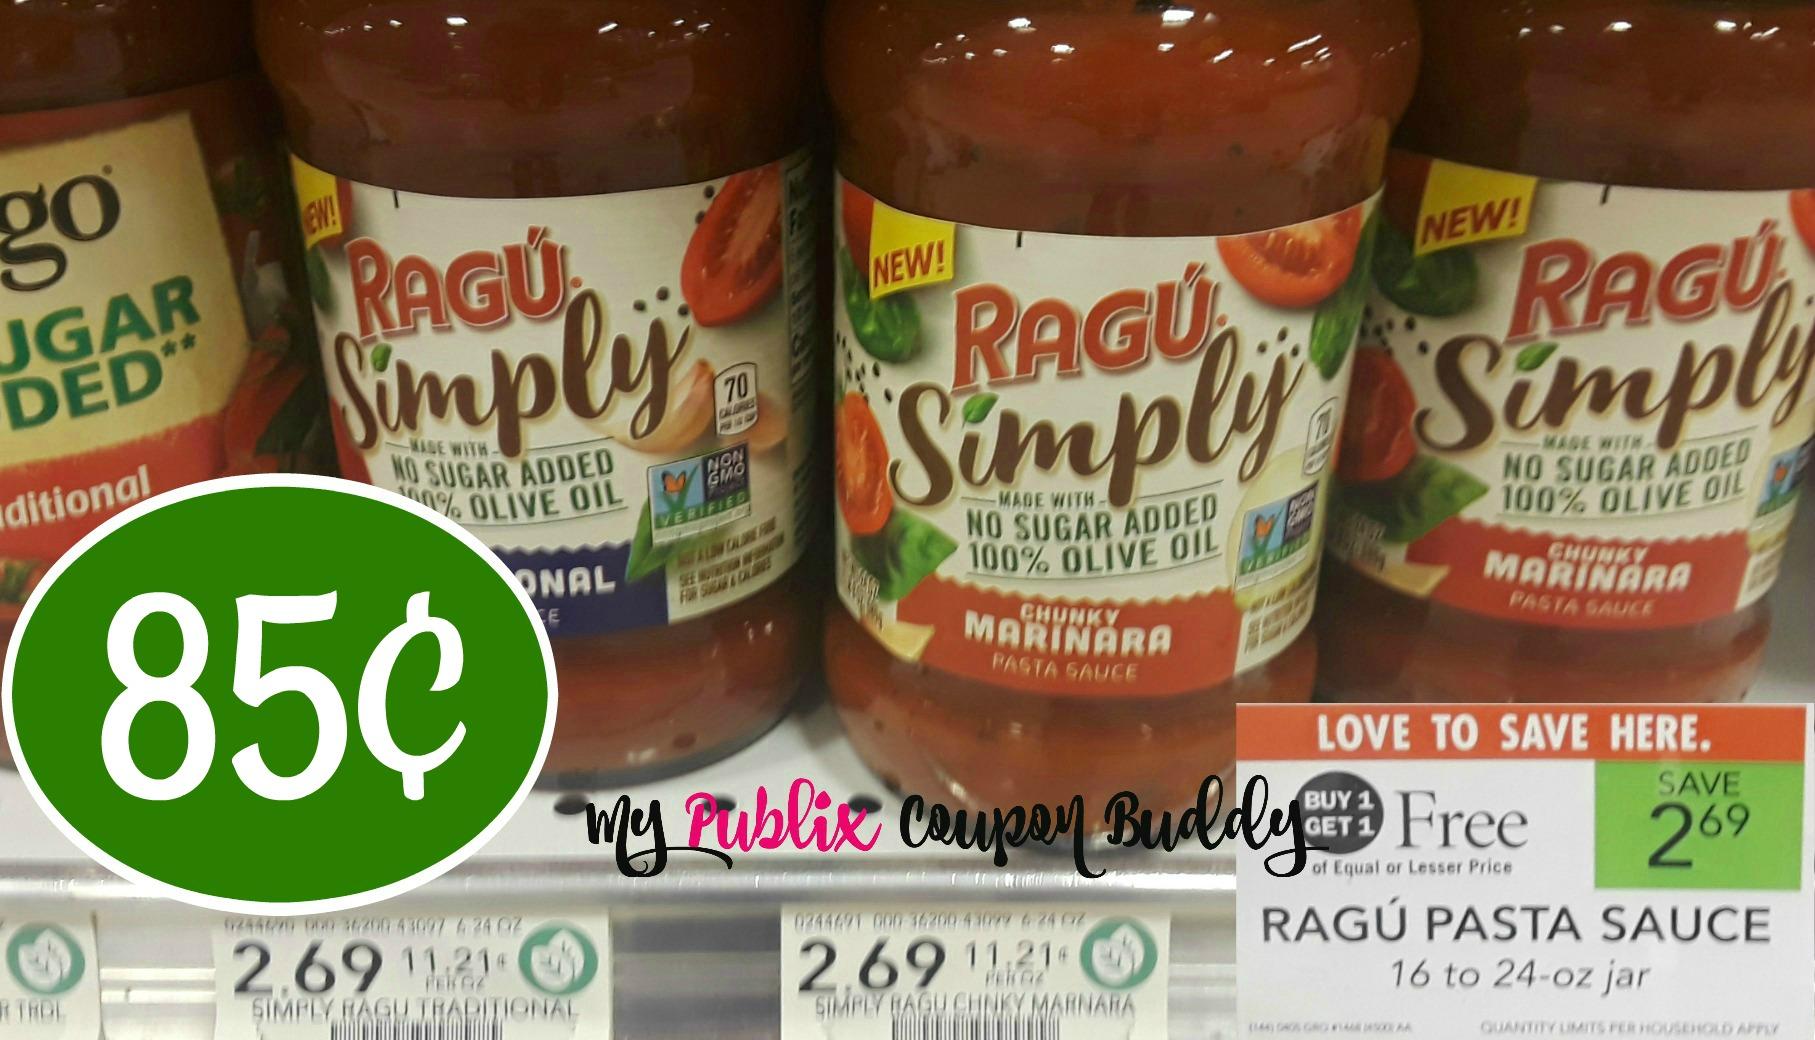 picture regarding Ragu Printable Coupons identify Ragu Pasta Sauce 85¢ at Publix My Publix Coupon Mate